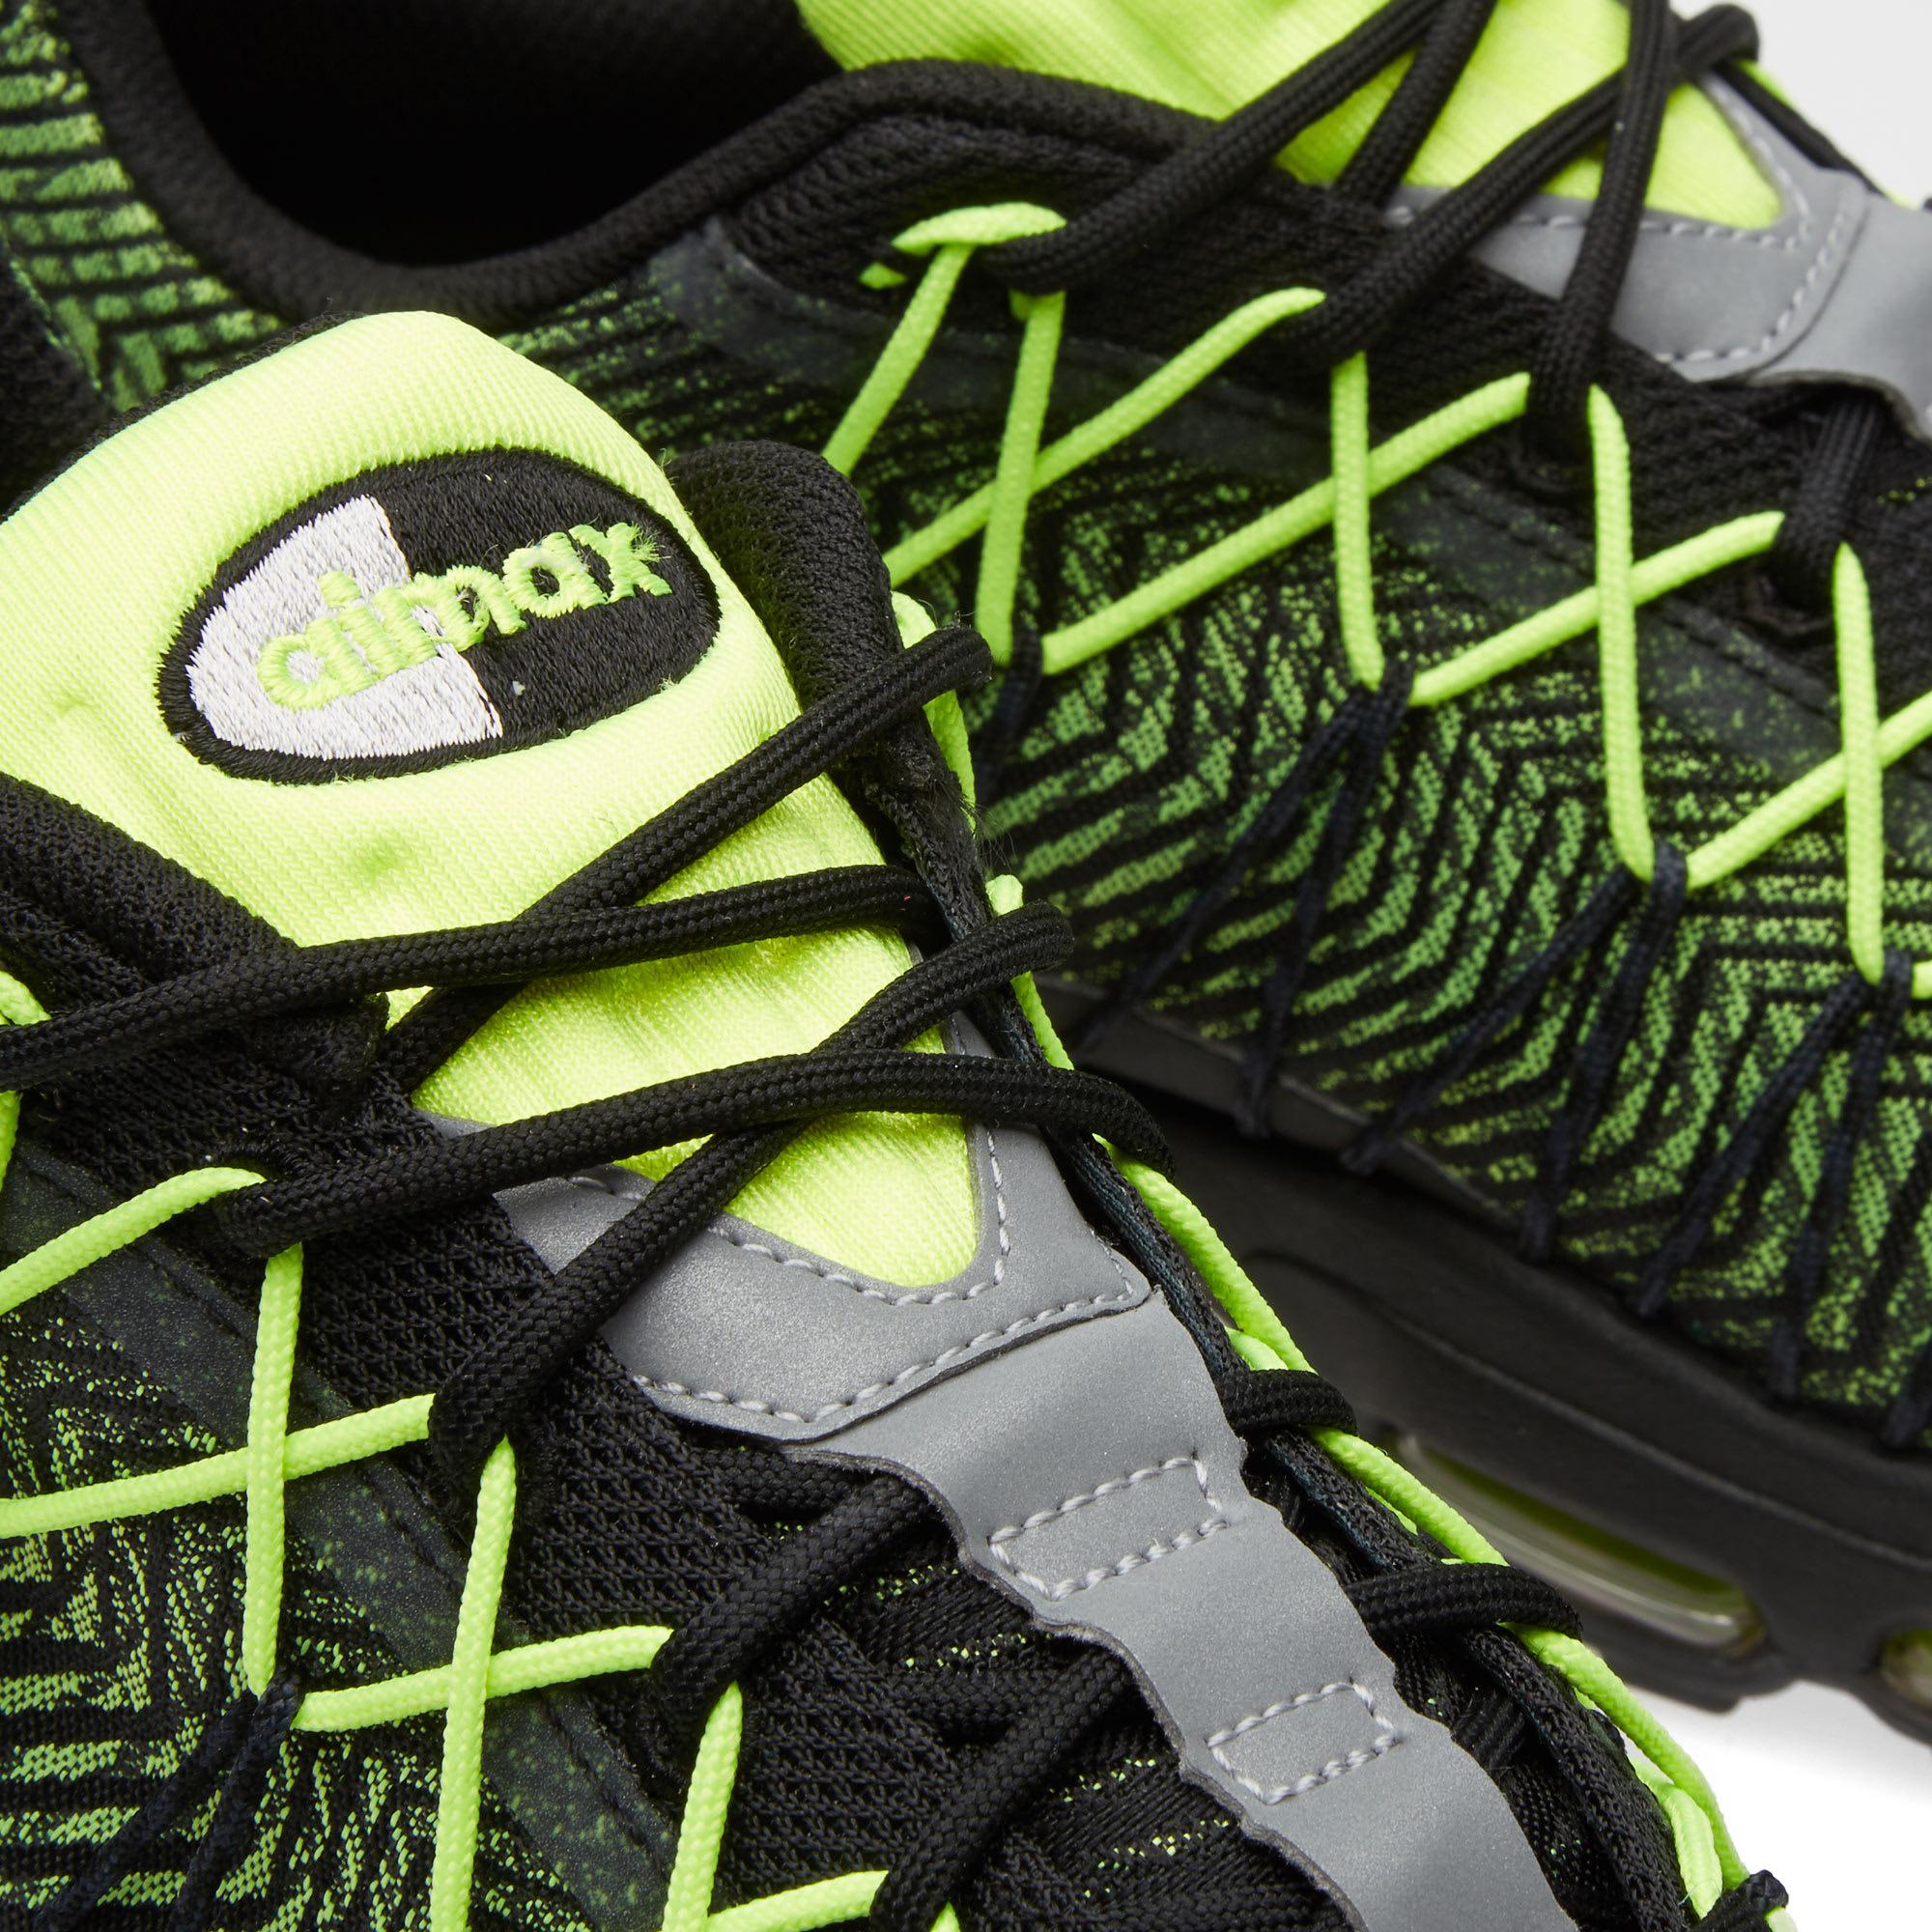 new arrival 4a9b8 5a48e Nike Air Max 95 Ultra JCRD Black, Volt   Dark Grey   END.